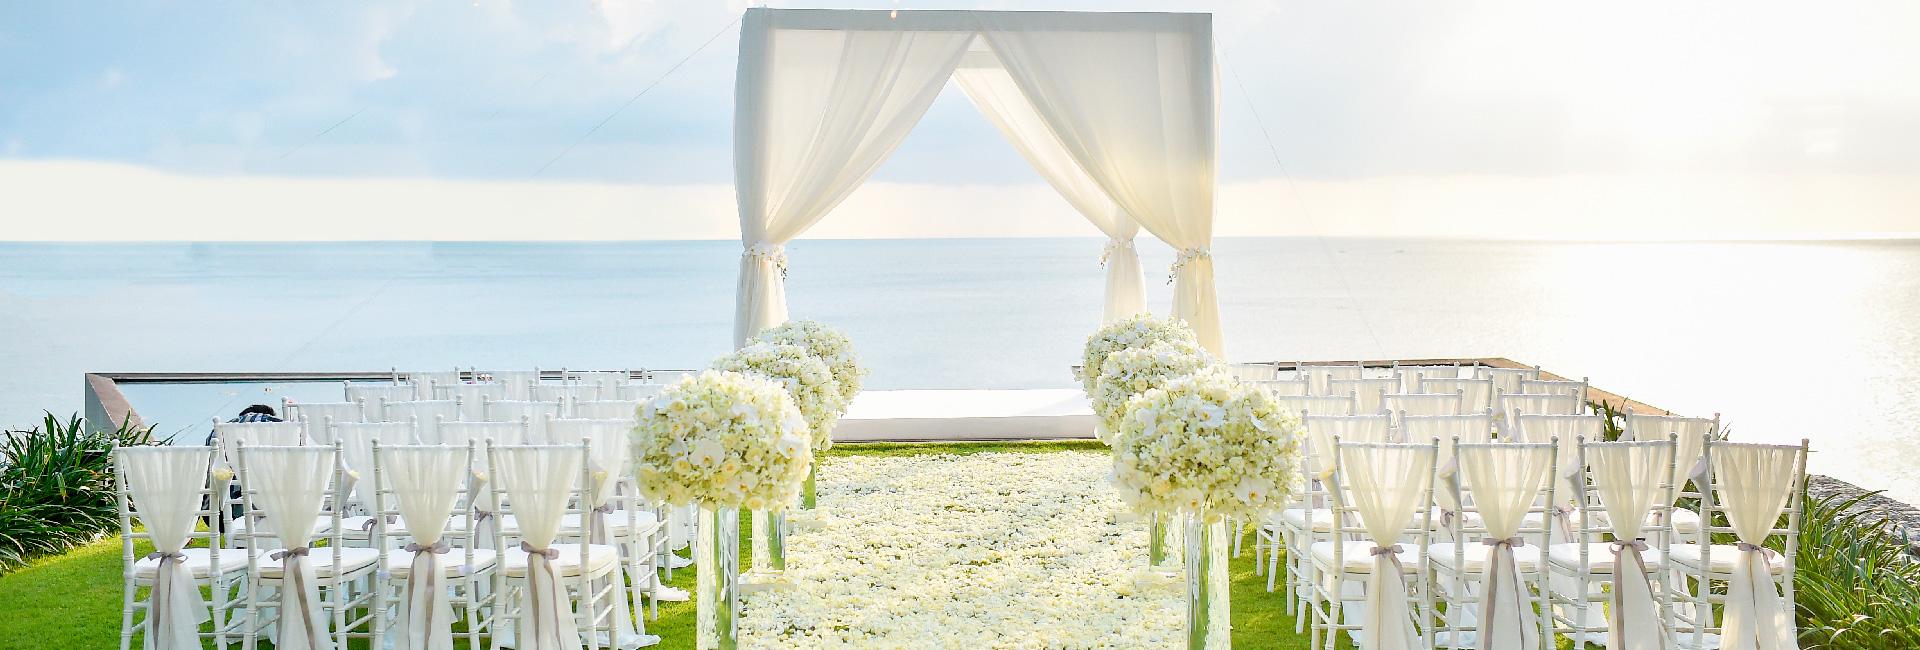 The best puerto vallarta wedding packages1920x650